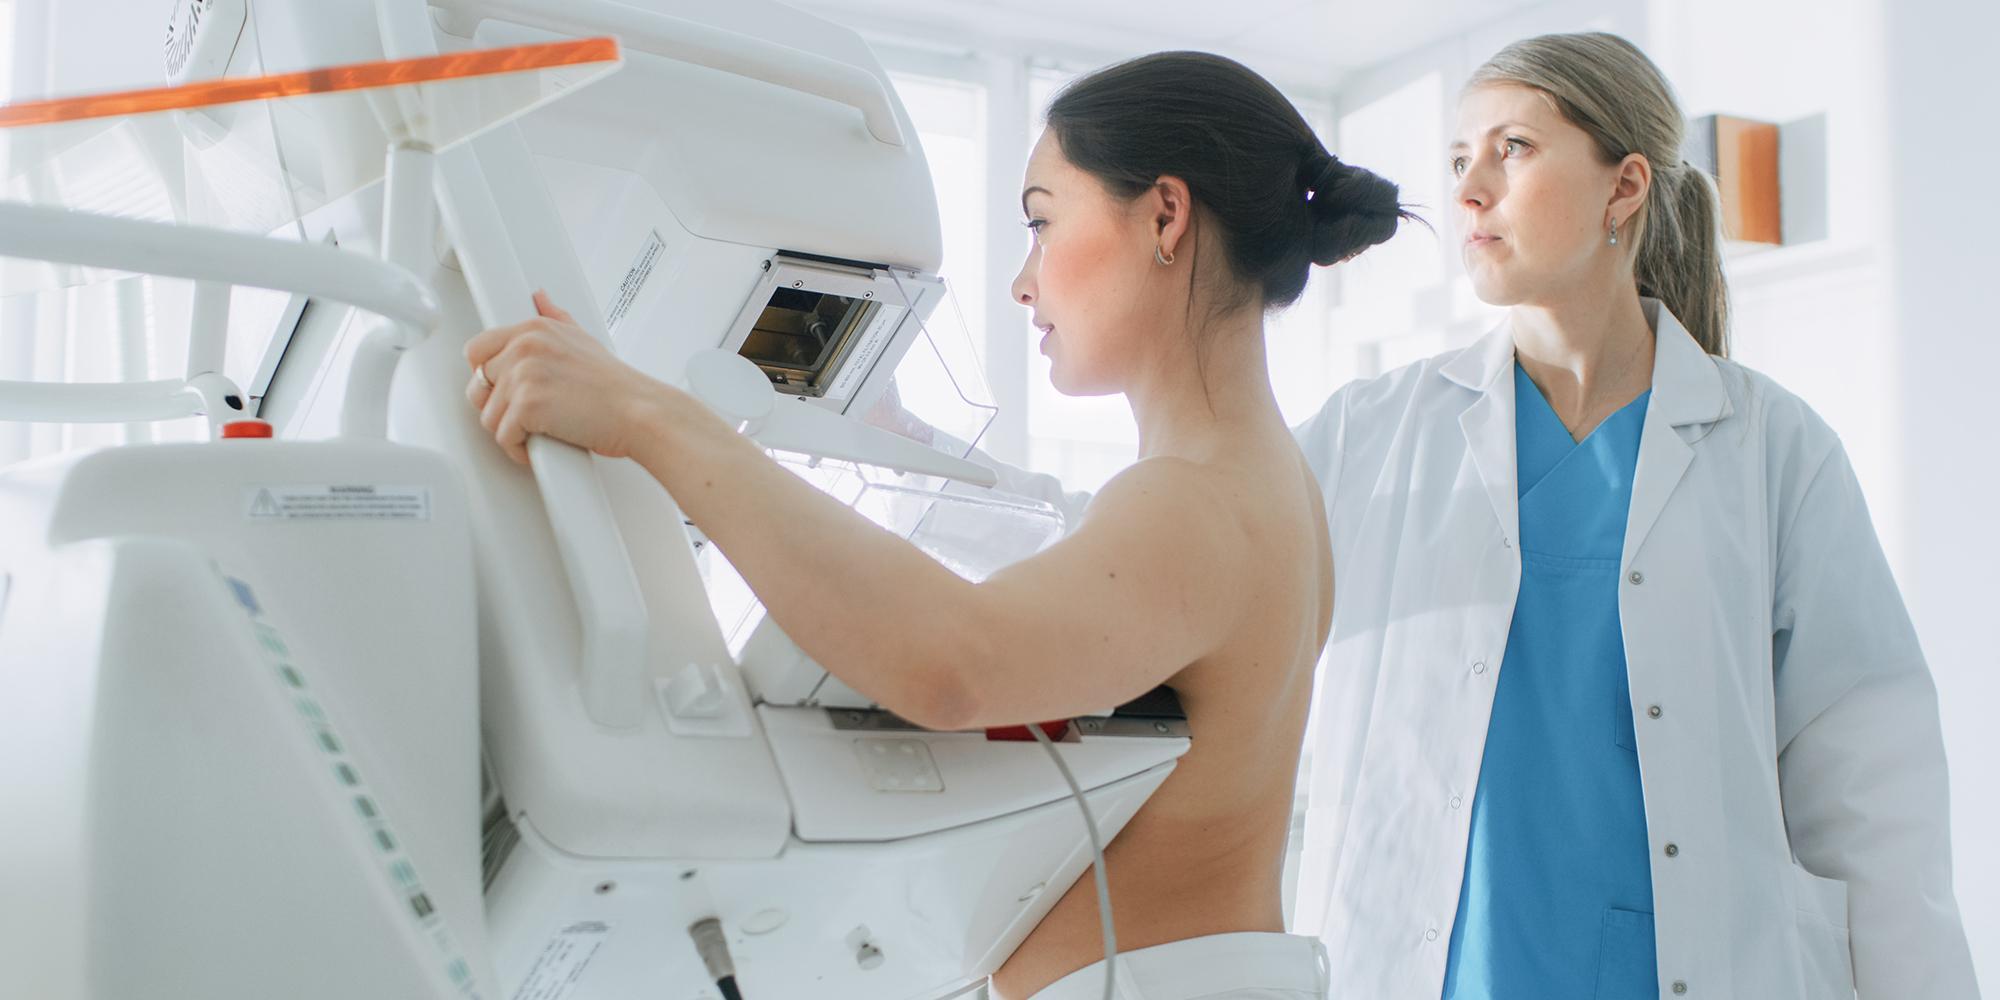 Вакцина против вируса папилломы человека защищает и от рака груди